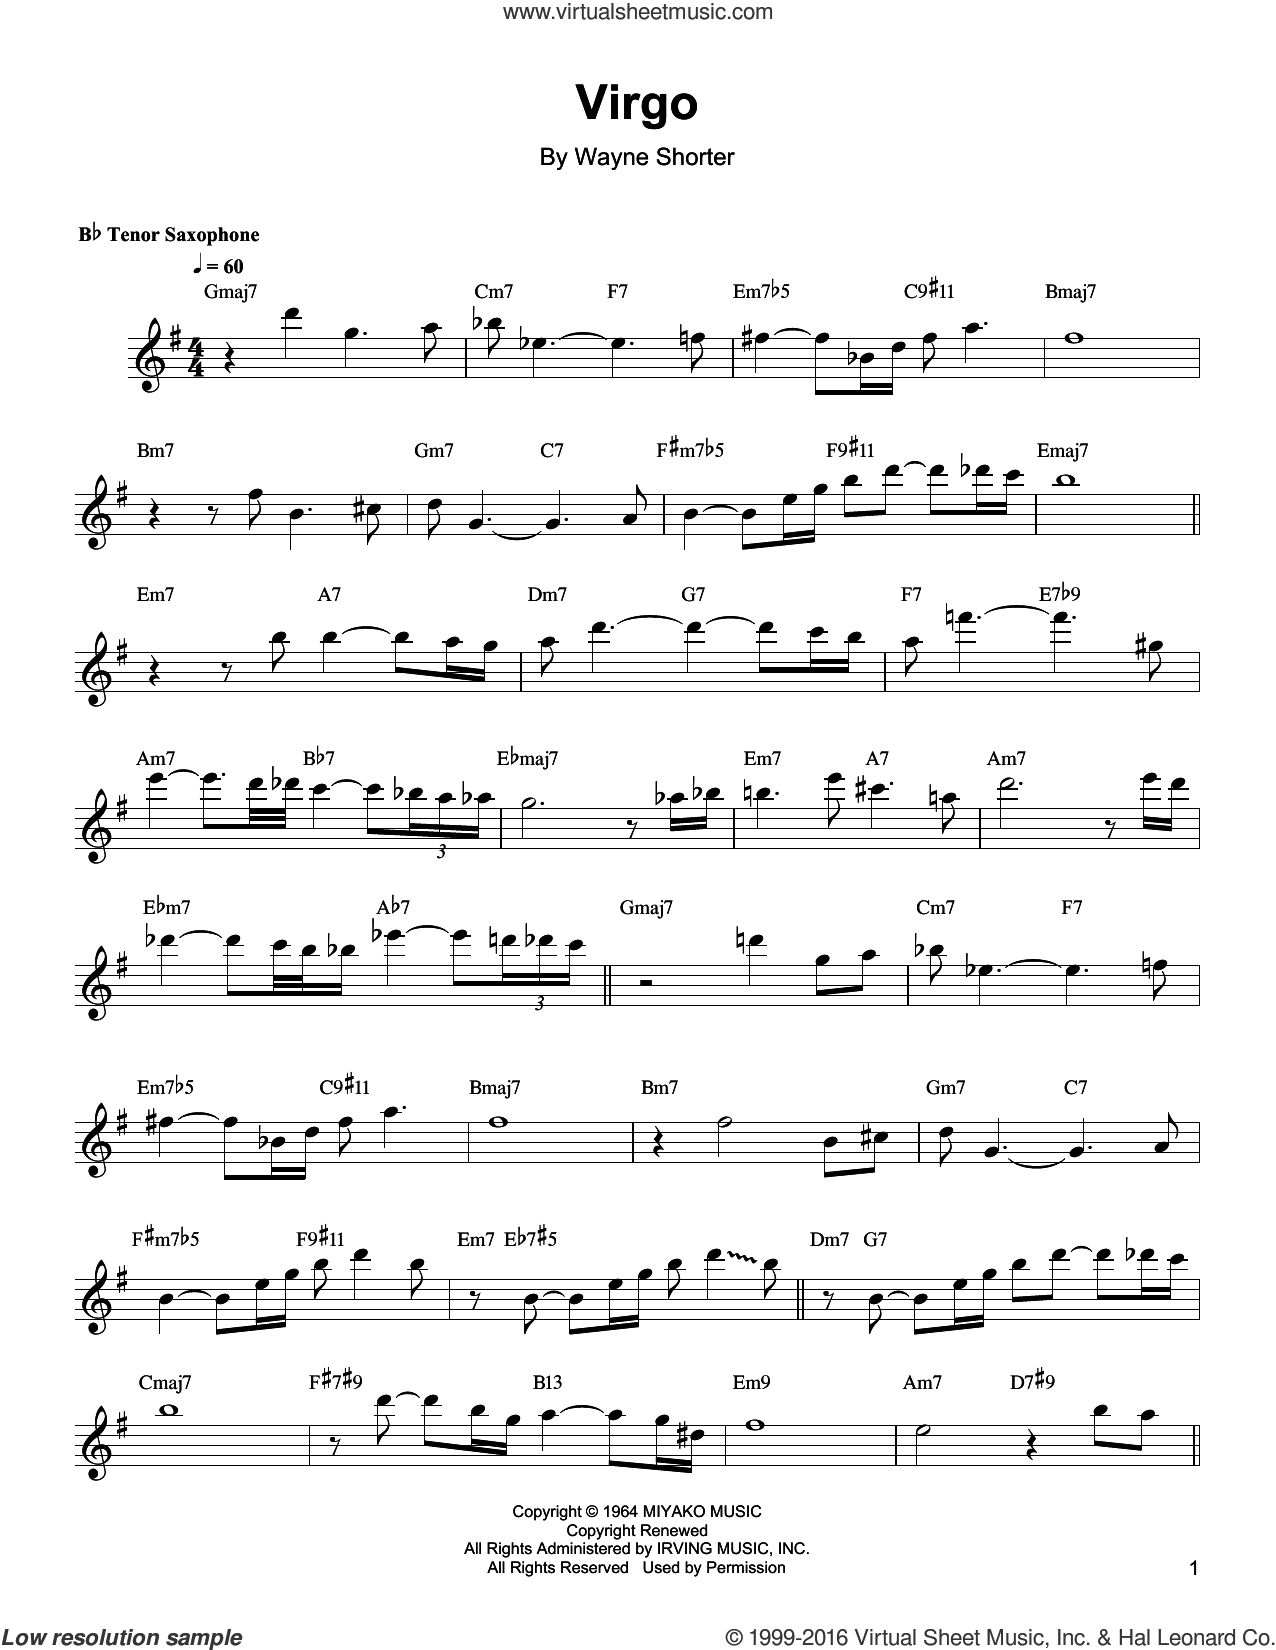 Virgo sheet music for tenor saxophone solo (transcription) by Wayne Shorter, intermediate tenor saxophone (transcription)